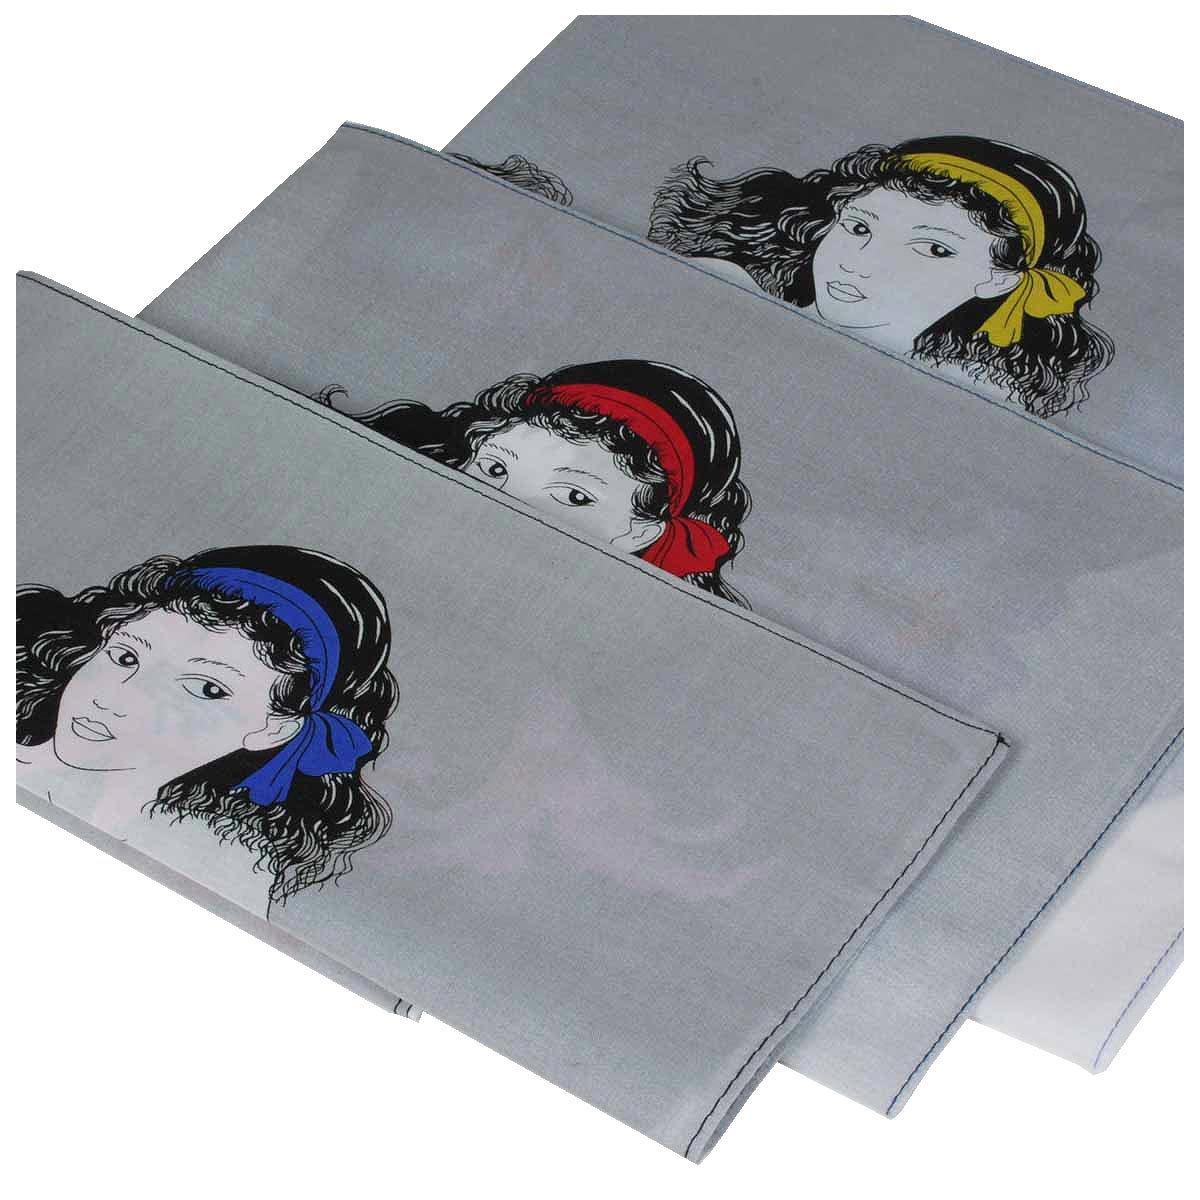 Petrouchka printed handkerchiefs - 3 units Armando Caruso